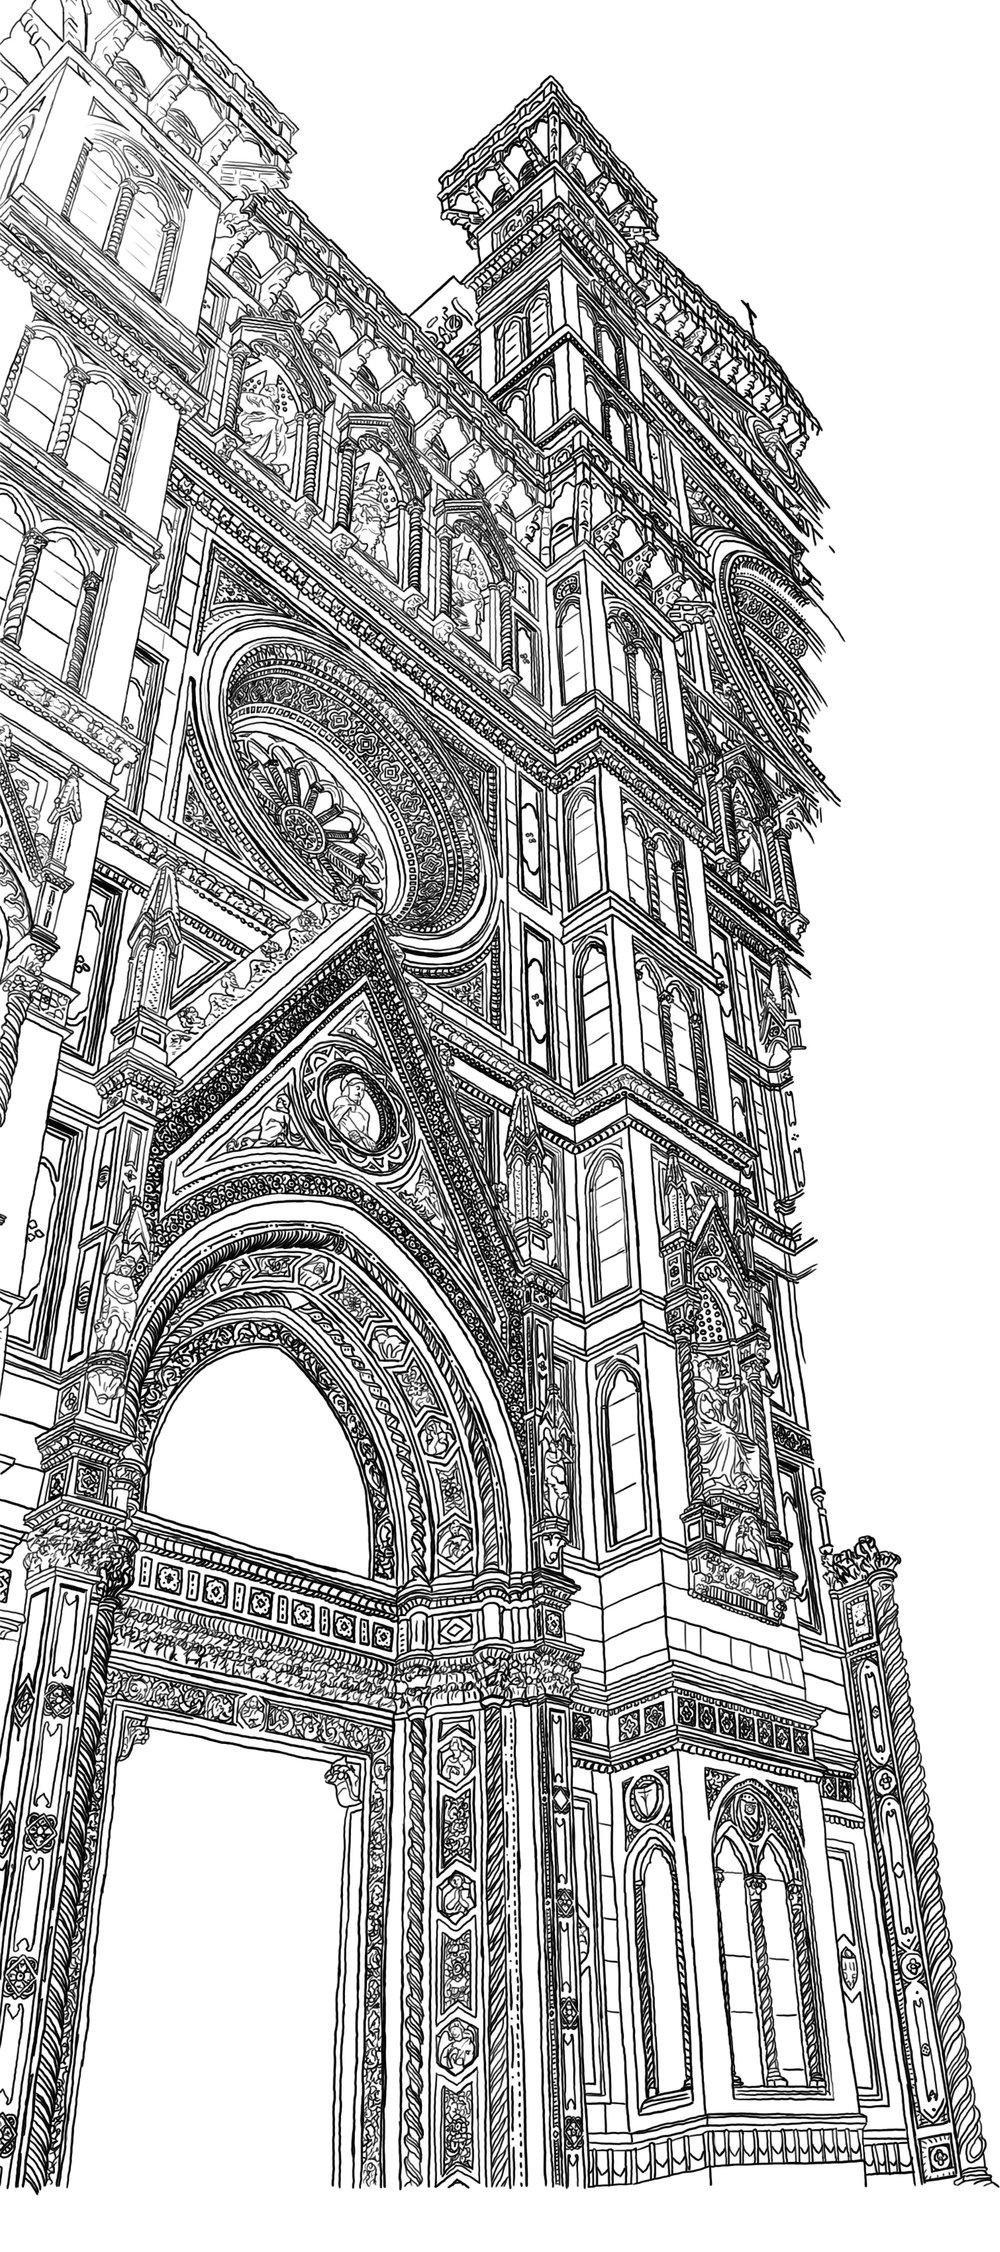 The Florence Duomo